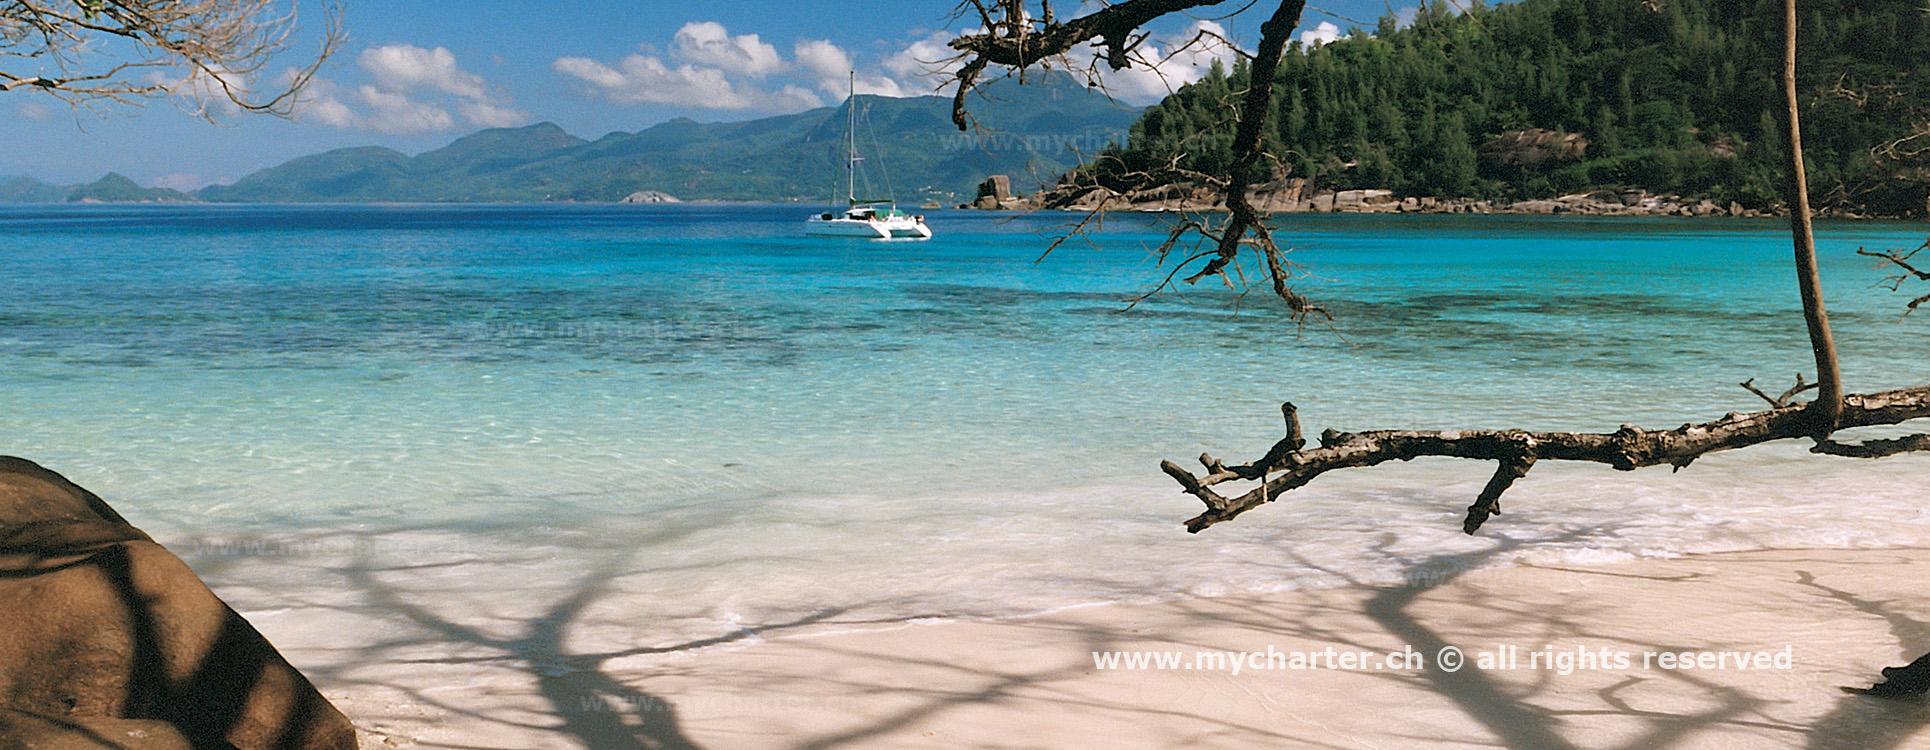 Seychellen - Anse Petite